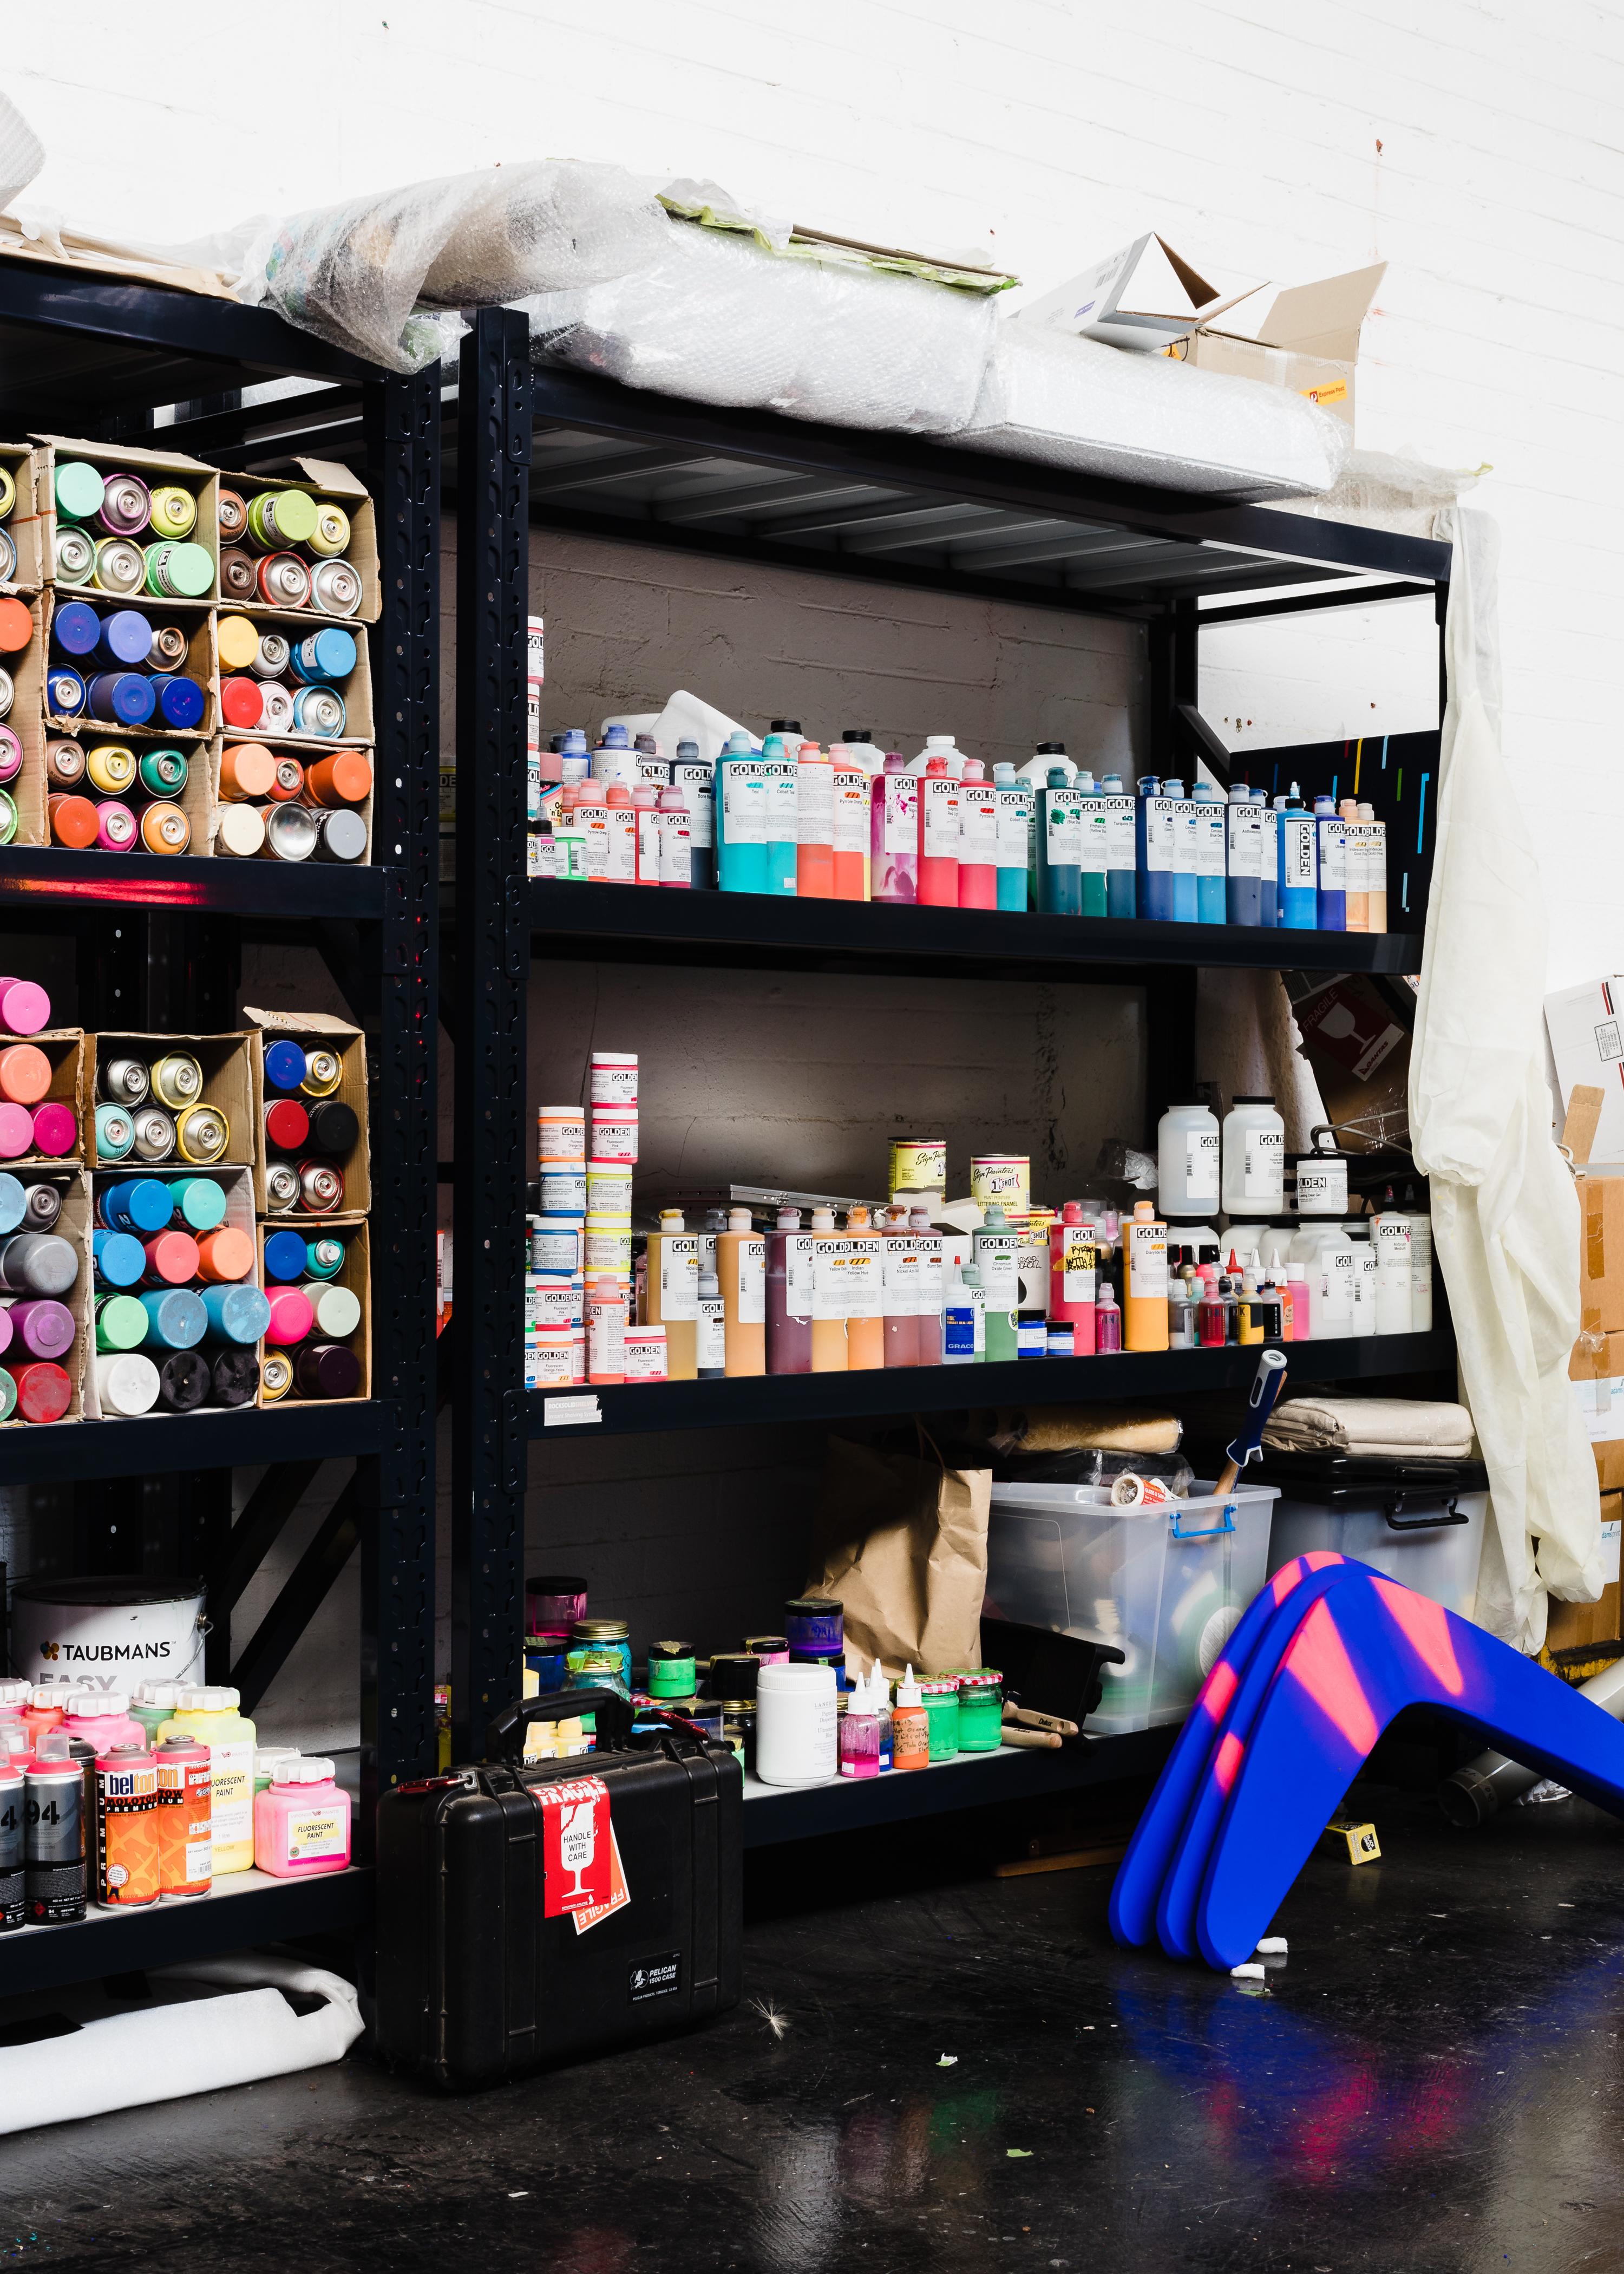 Harga Dan Spek Brands Rennie Mackintosh Architecture Picture Home Womenamp039s Retro 3 4 Sleeve Denim Slim Bubble T Shirt Dress Reko For Tdf Amelia Stanwix Photography Sweet Full Story